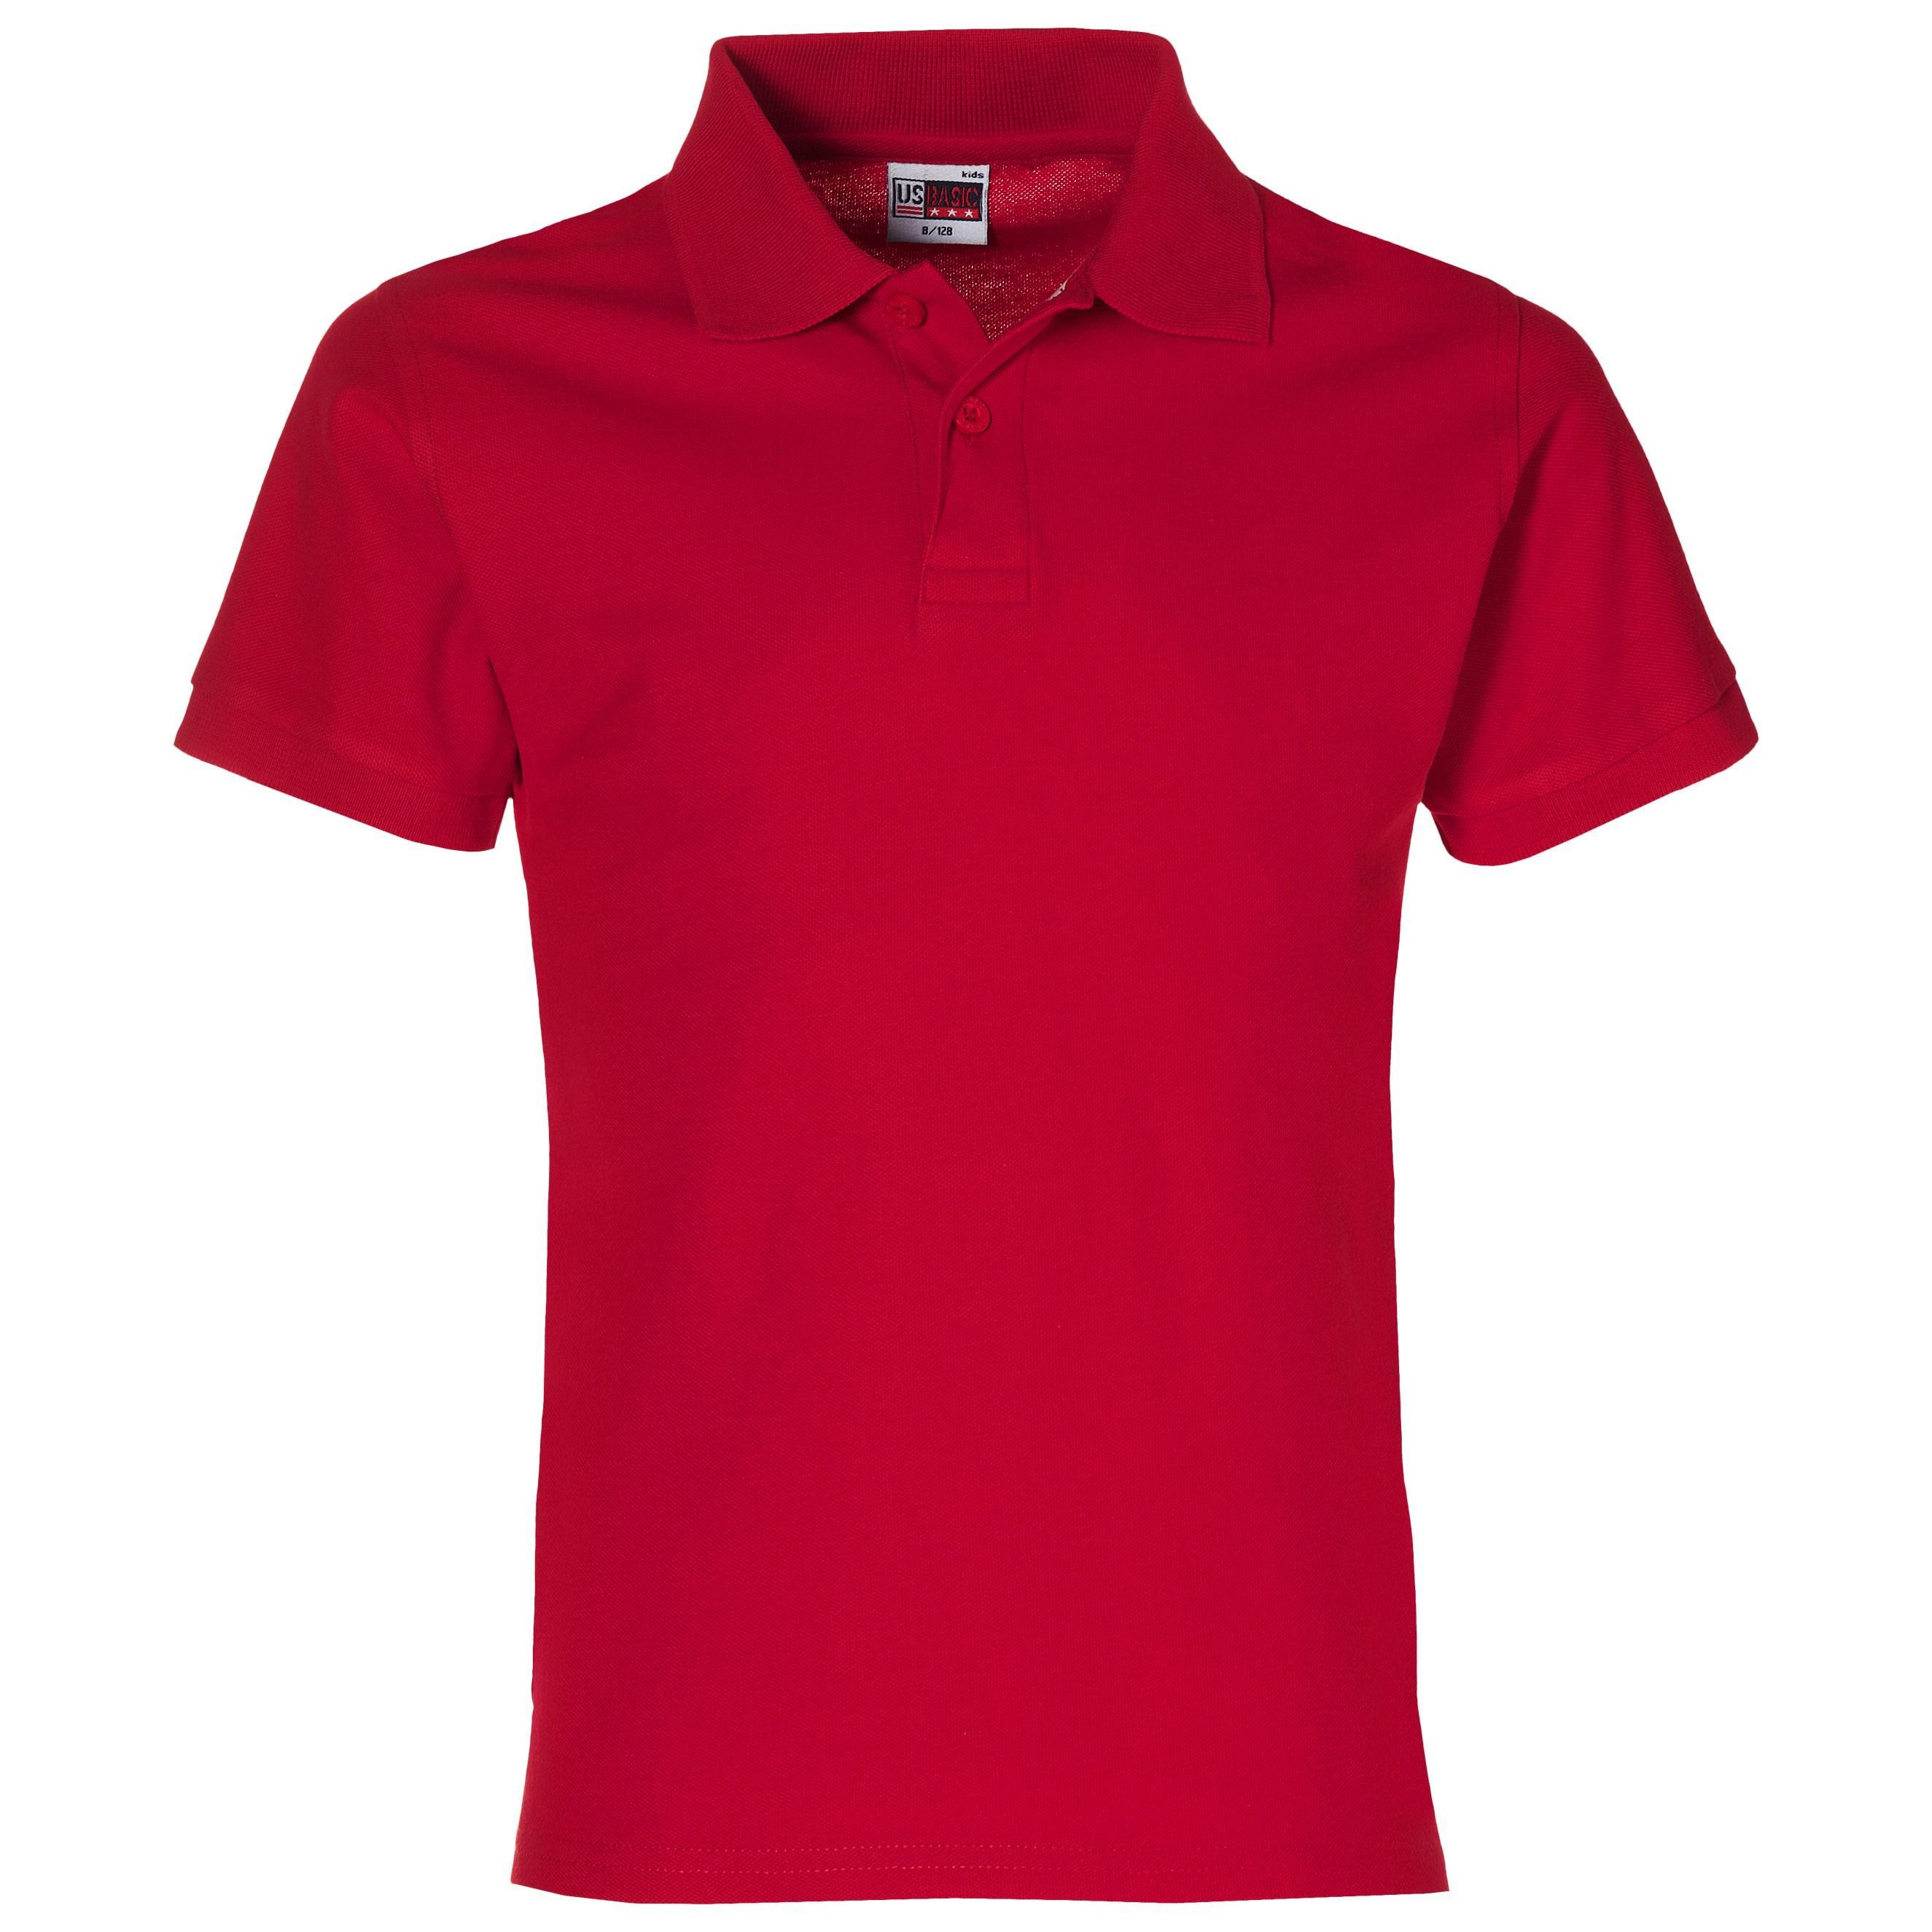 Boston Kids Golf Shirt - Red Only